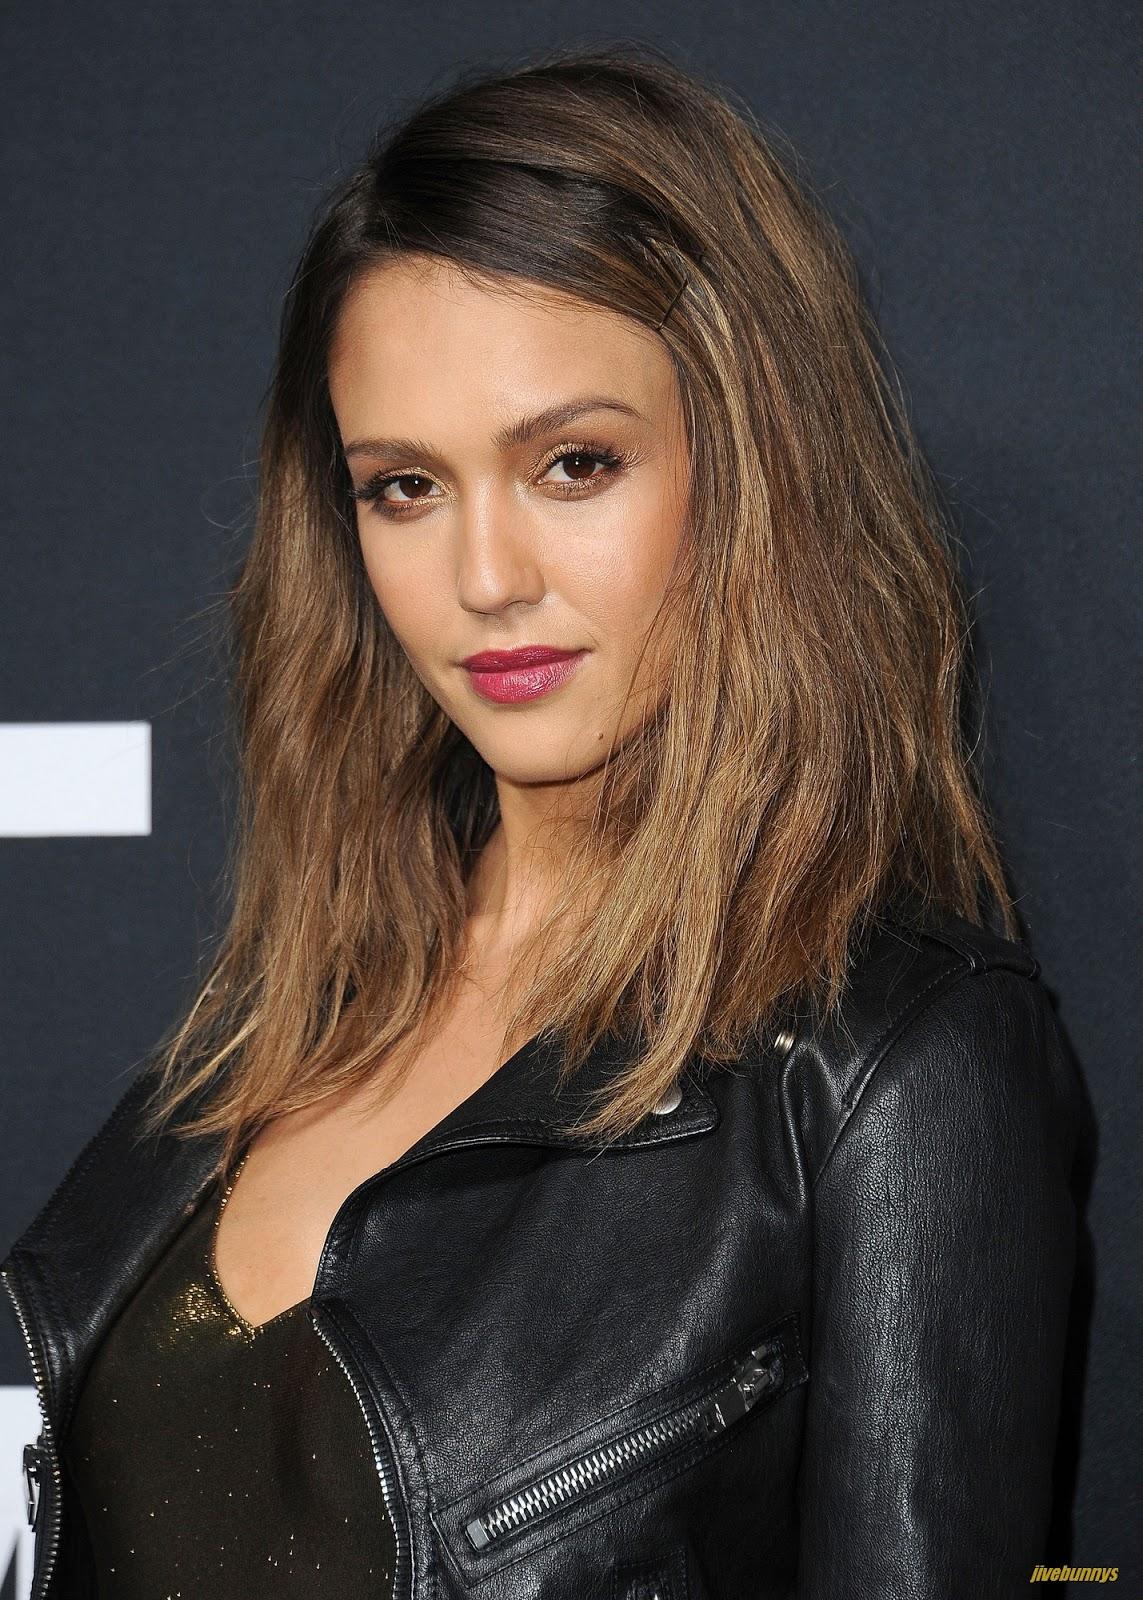 Jivebunnys Female Celebrity Picture Gallery: Jessica Alba ...